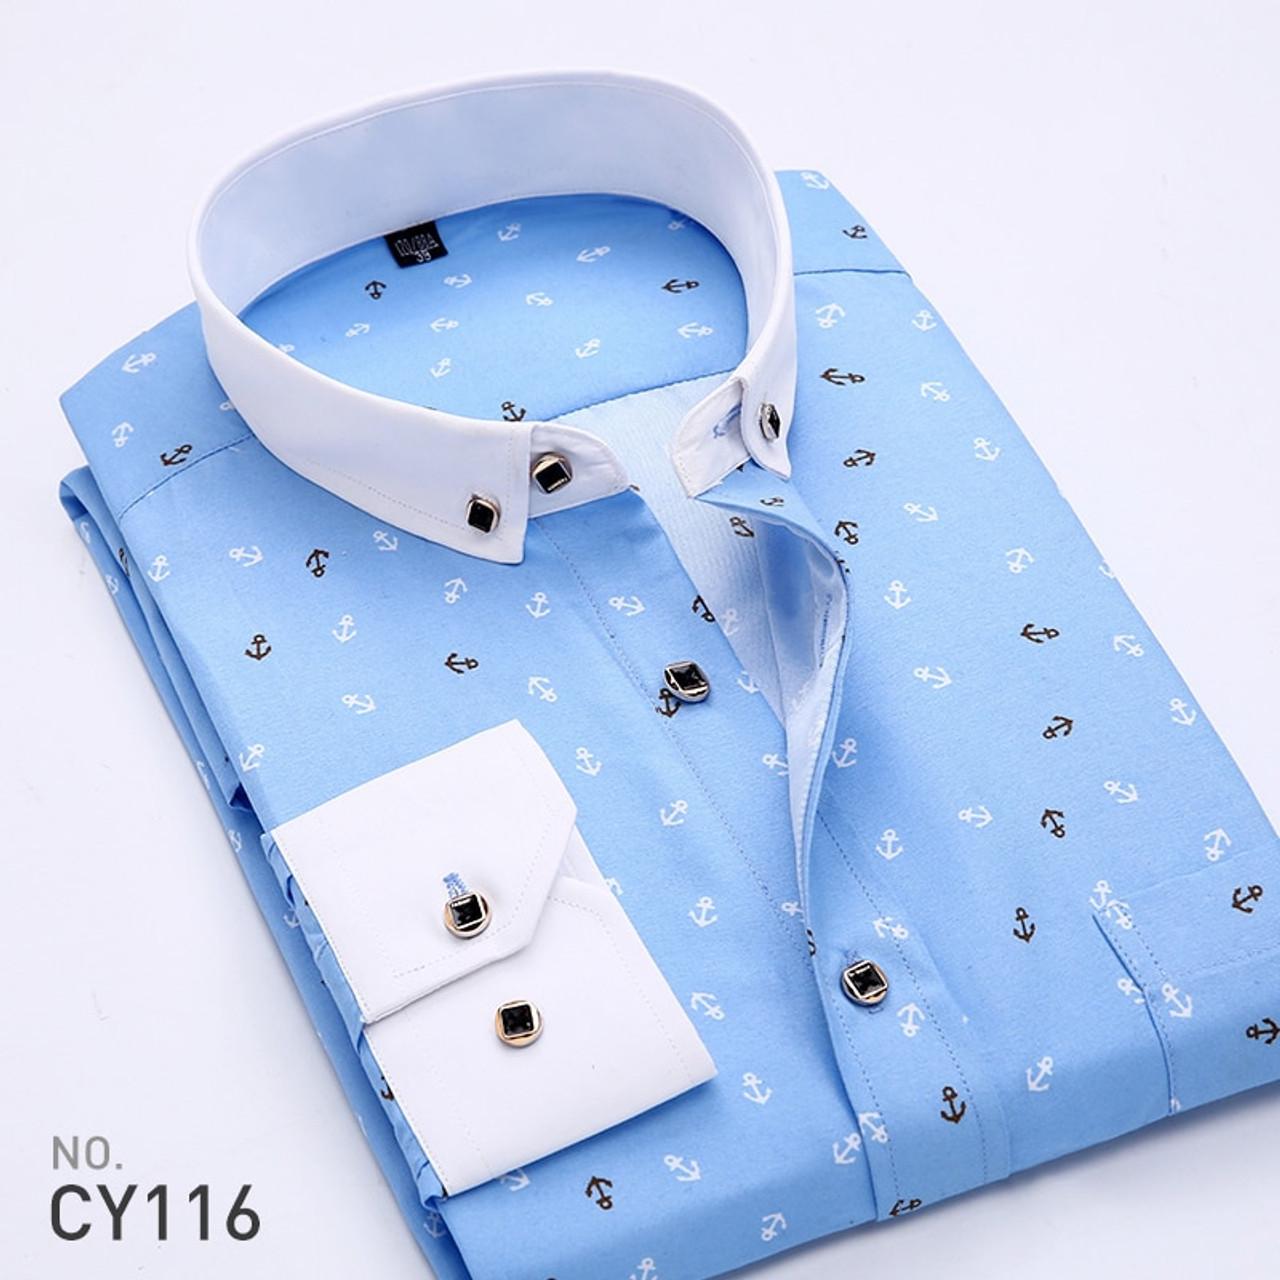 985e5901 ... 2018 Retro Floral Printed Men Casual Shirts Classic Men Dress Shirt  Men's Long Sleeve Brand New ...